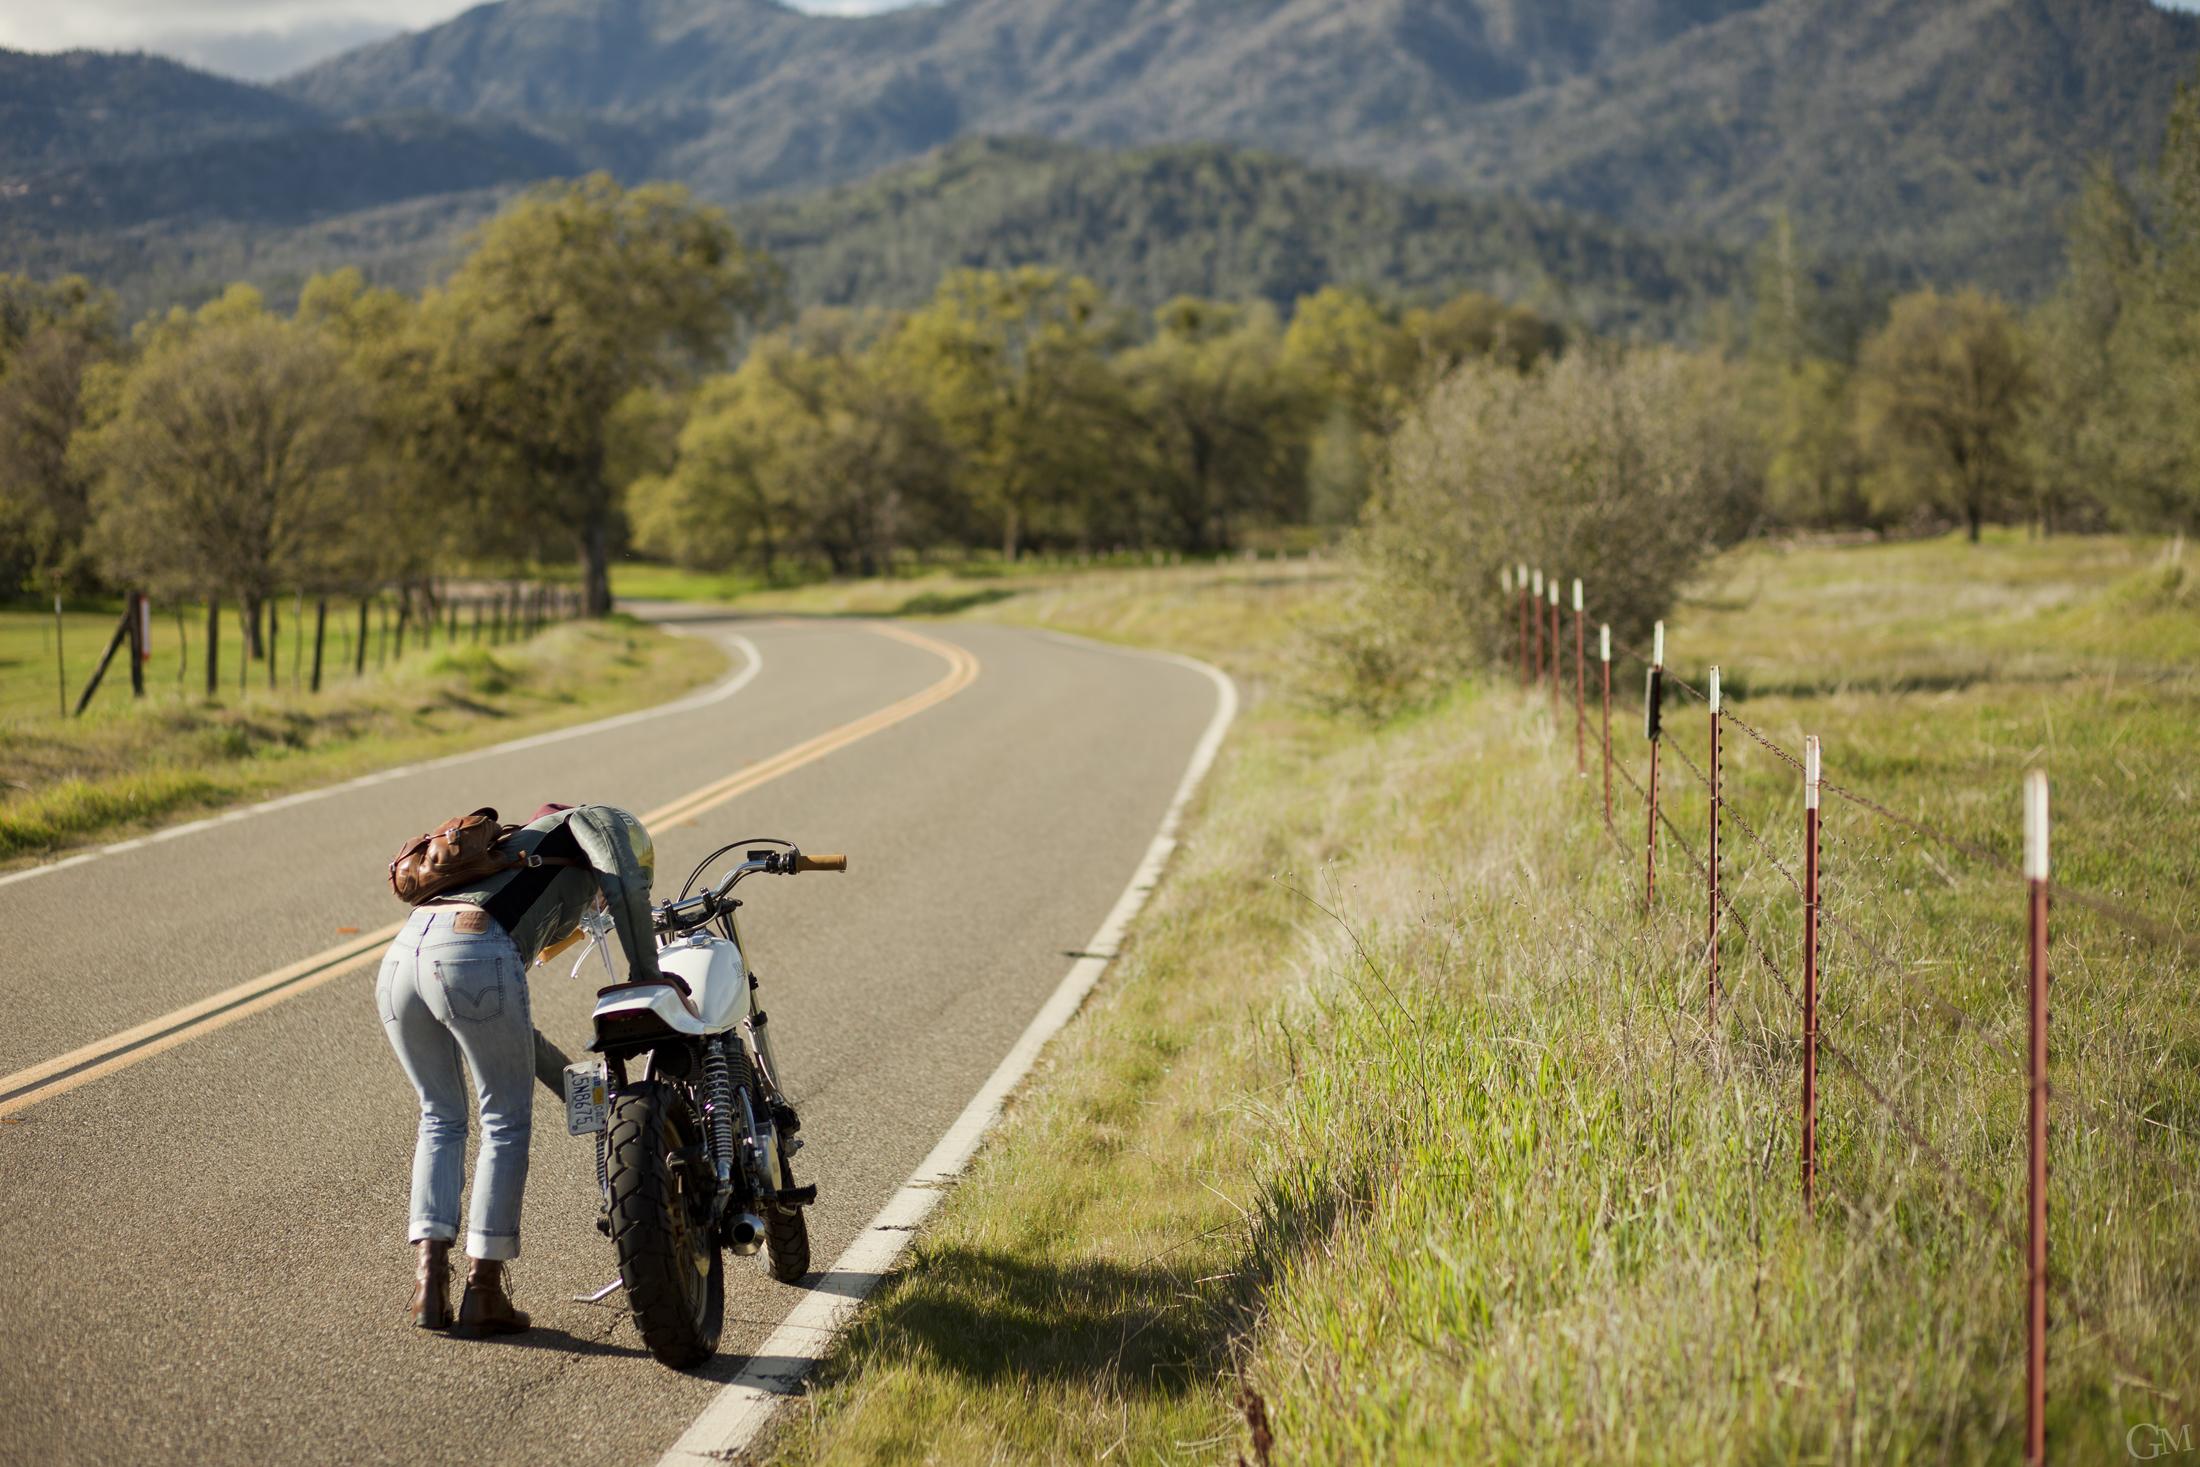 California Up Vintage Honda Four One Cafe Photographer Lifestyle Down Motorbike Moto Motorcycle Yamaha Northern Redding